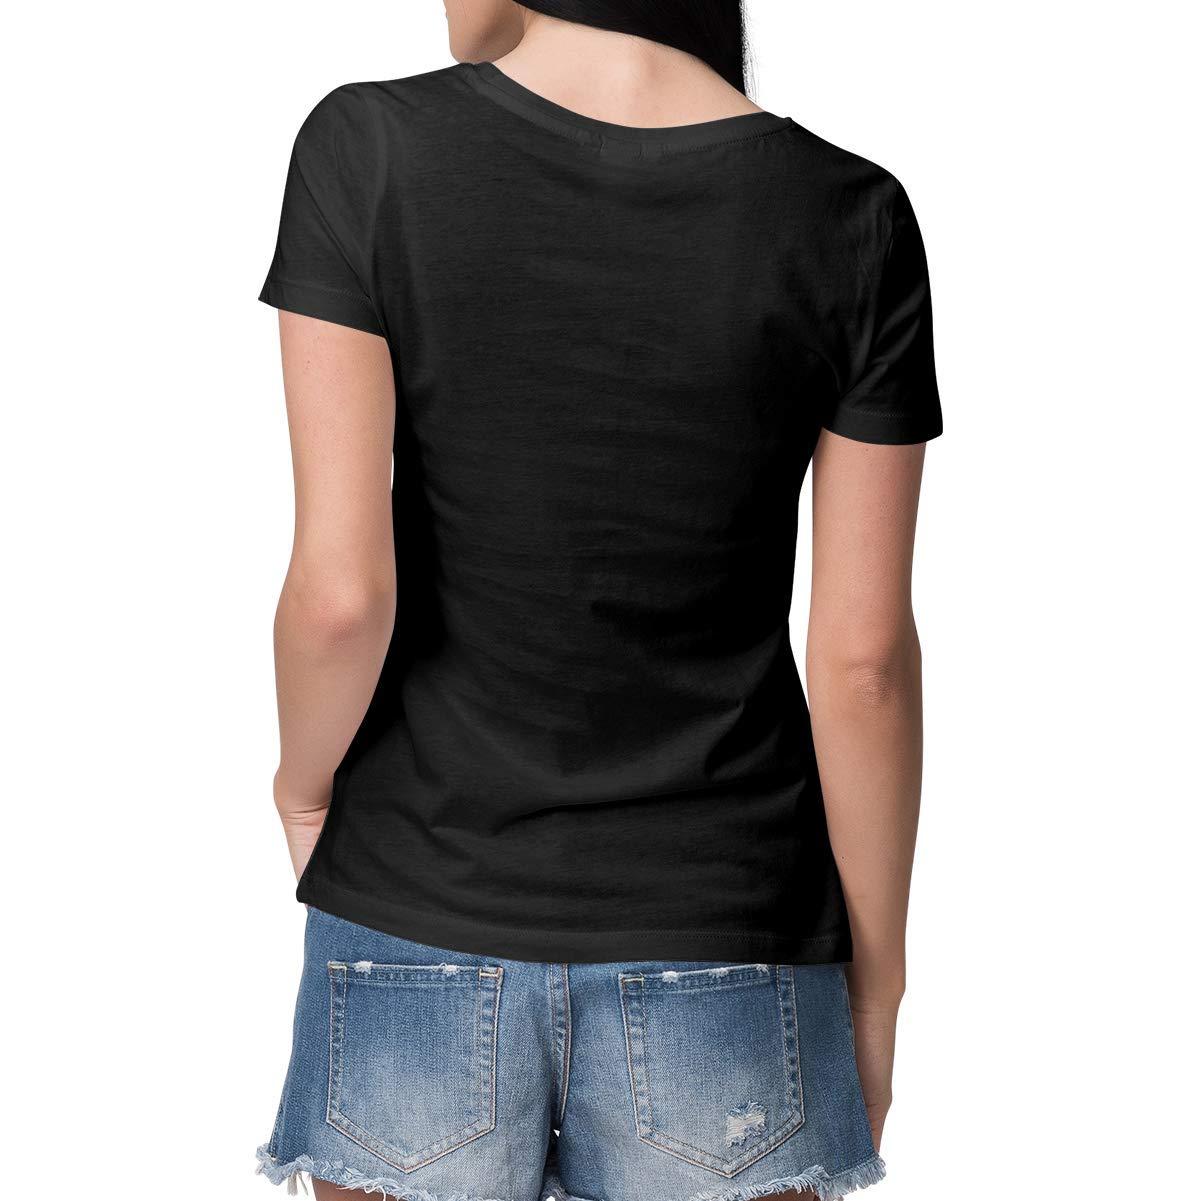 d3178a600f4a Amazon.com: Bugs Bunny - Gucci - Gucci Shirt Logo: Clothing